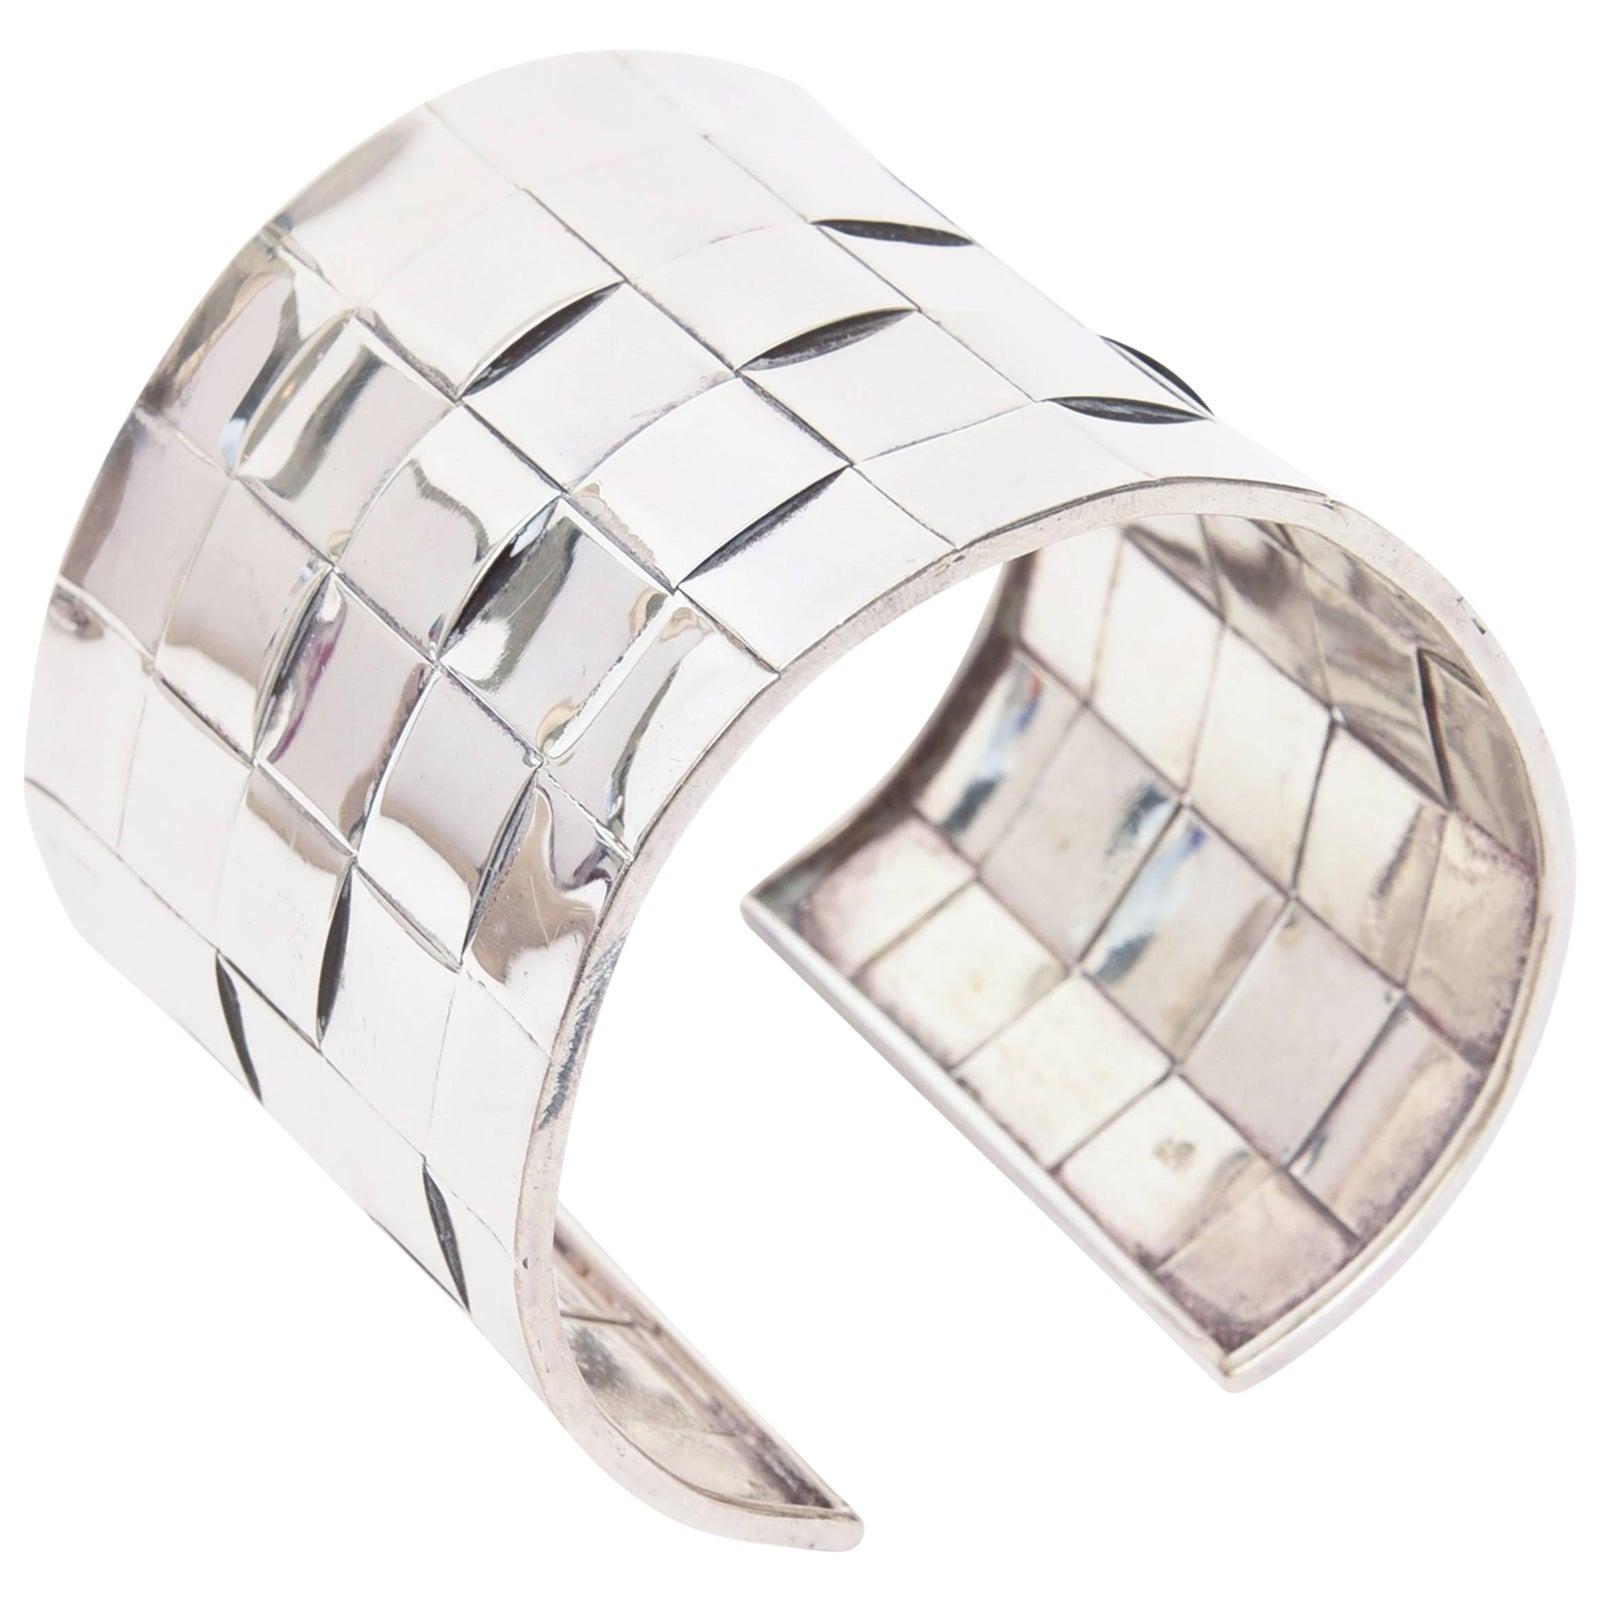 9c2cfaaec1c Sterling Silver Basket Weave Cuff Bracelet | Chairish